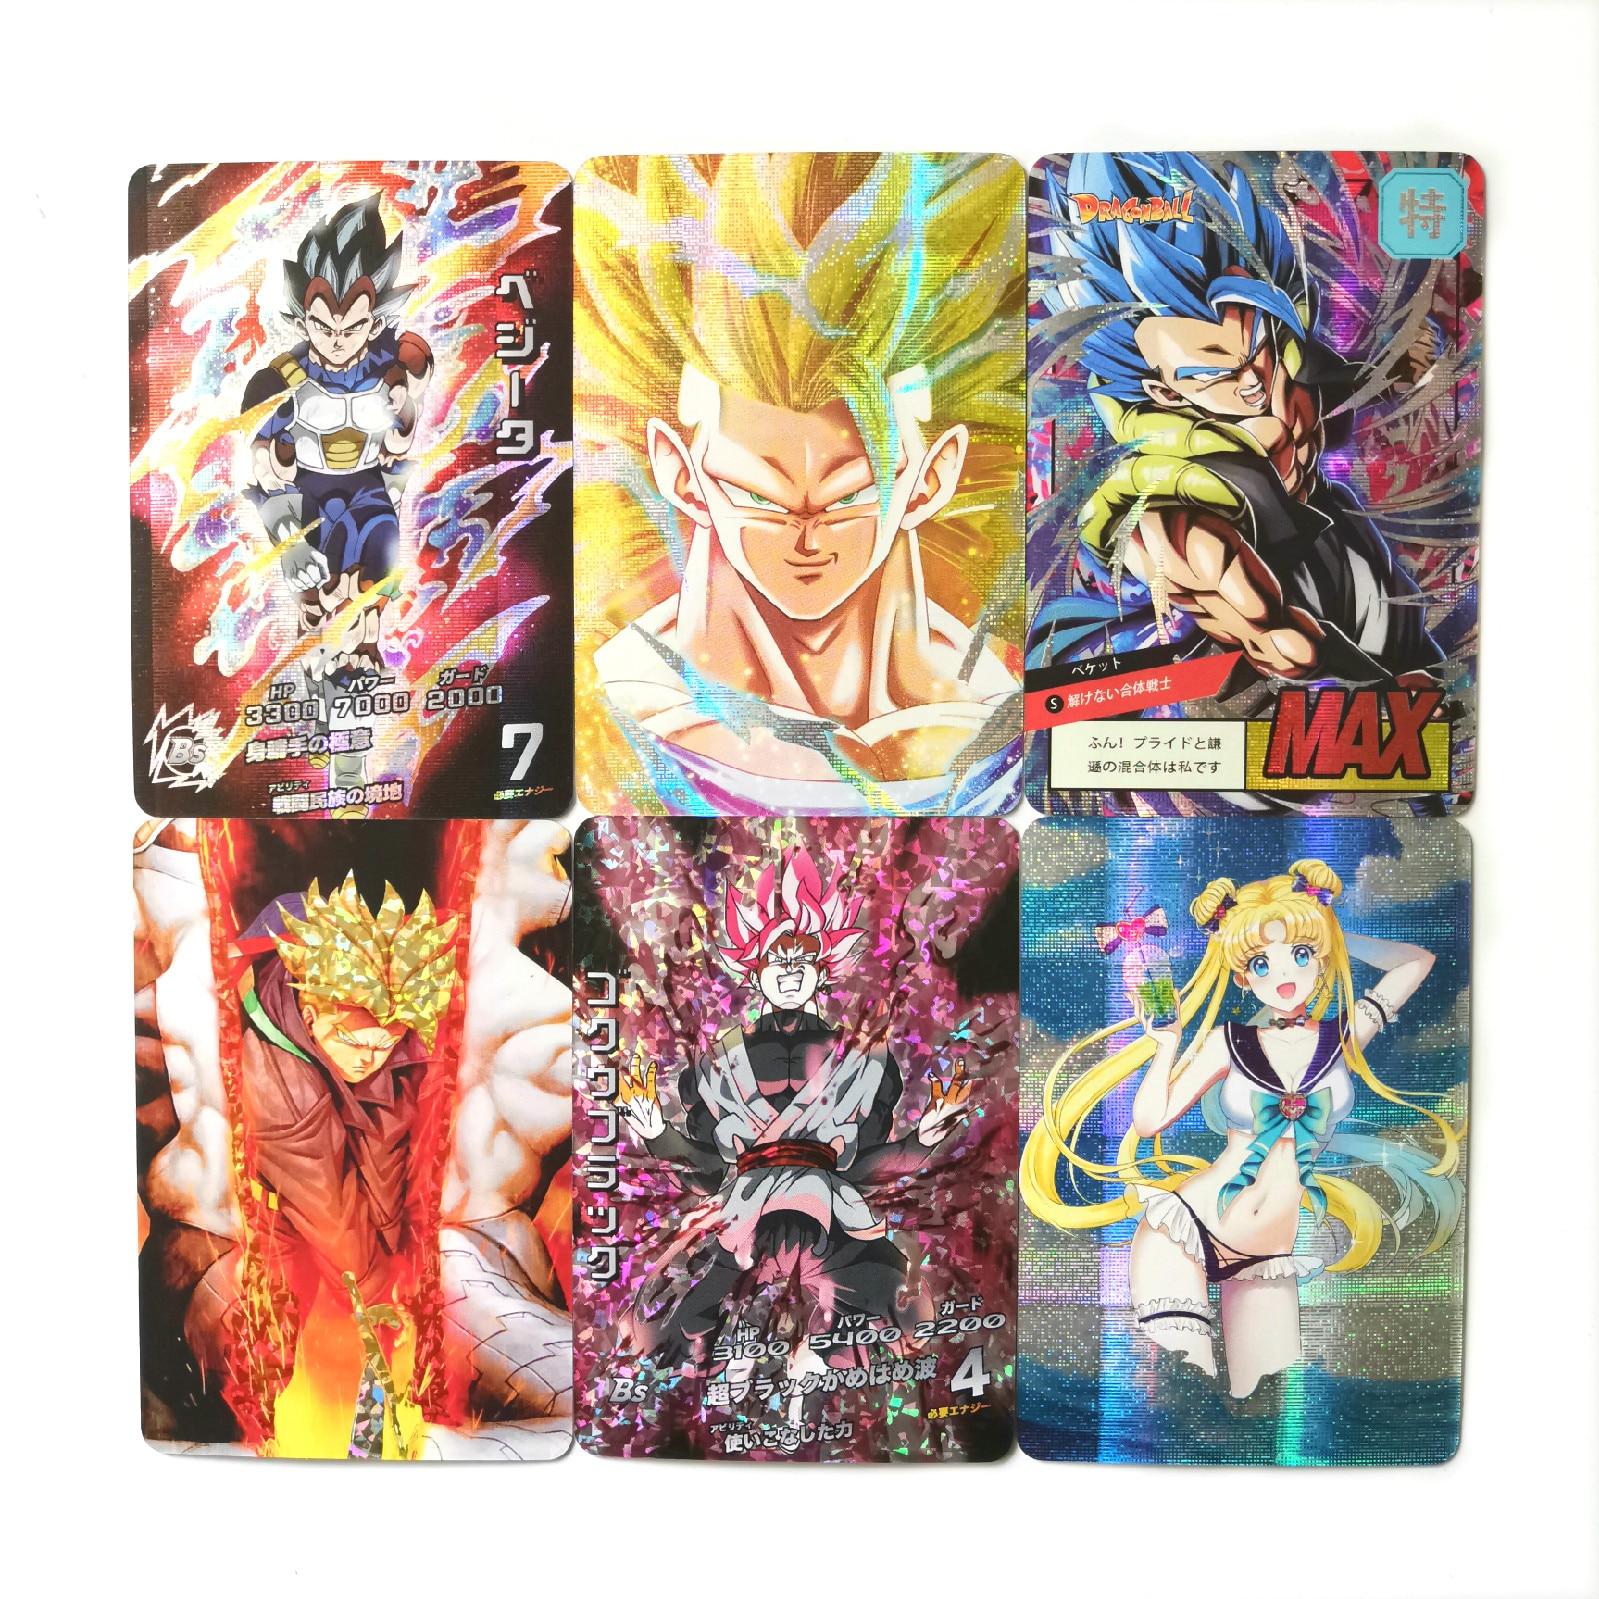 27 Styles Super Dragon Ball Z Sailor Moon Saint Seiya Heroes Battle Card Ultra Instinct Goku Vegeta Game Collection Cards